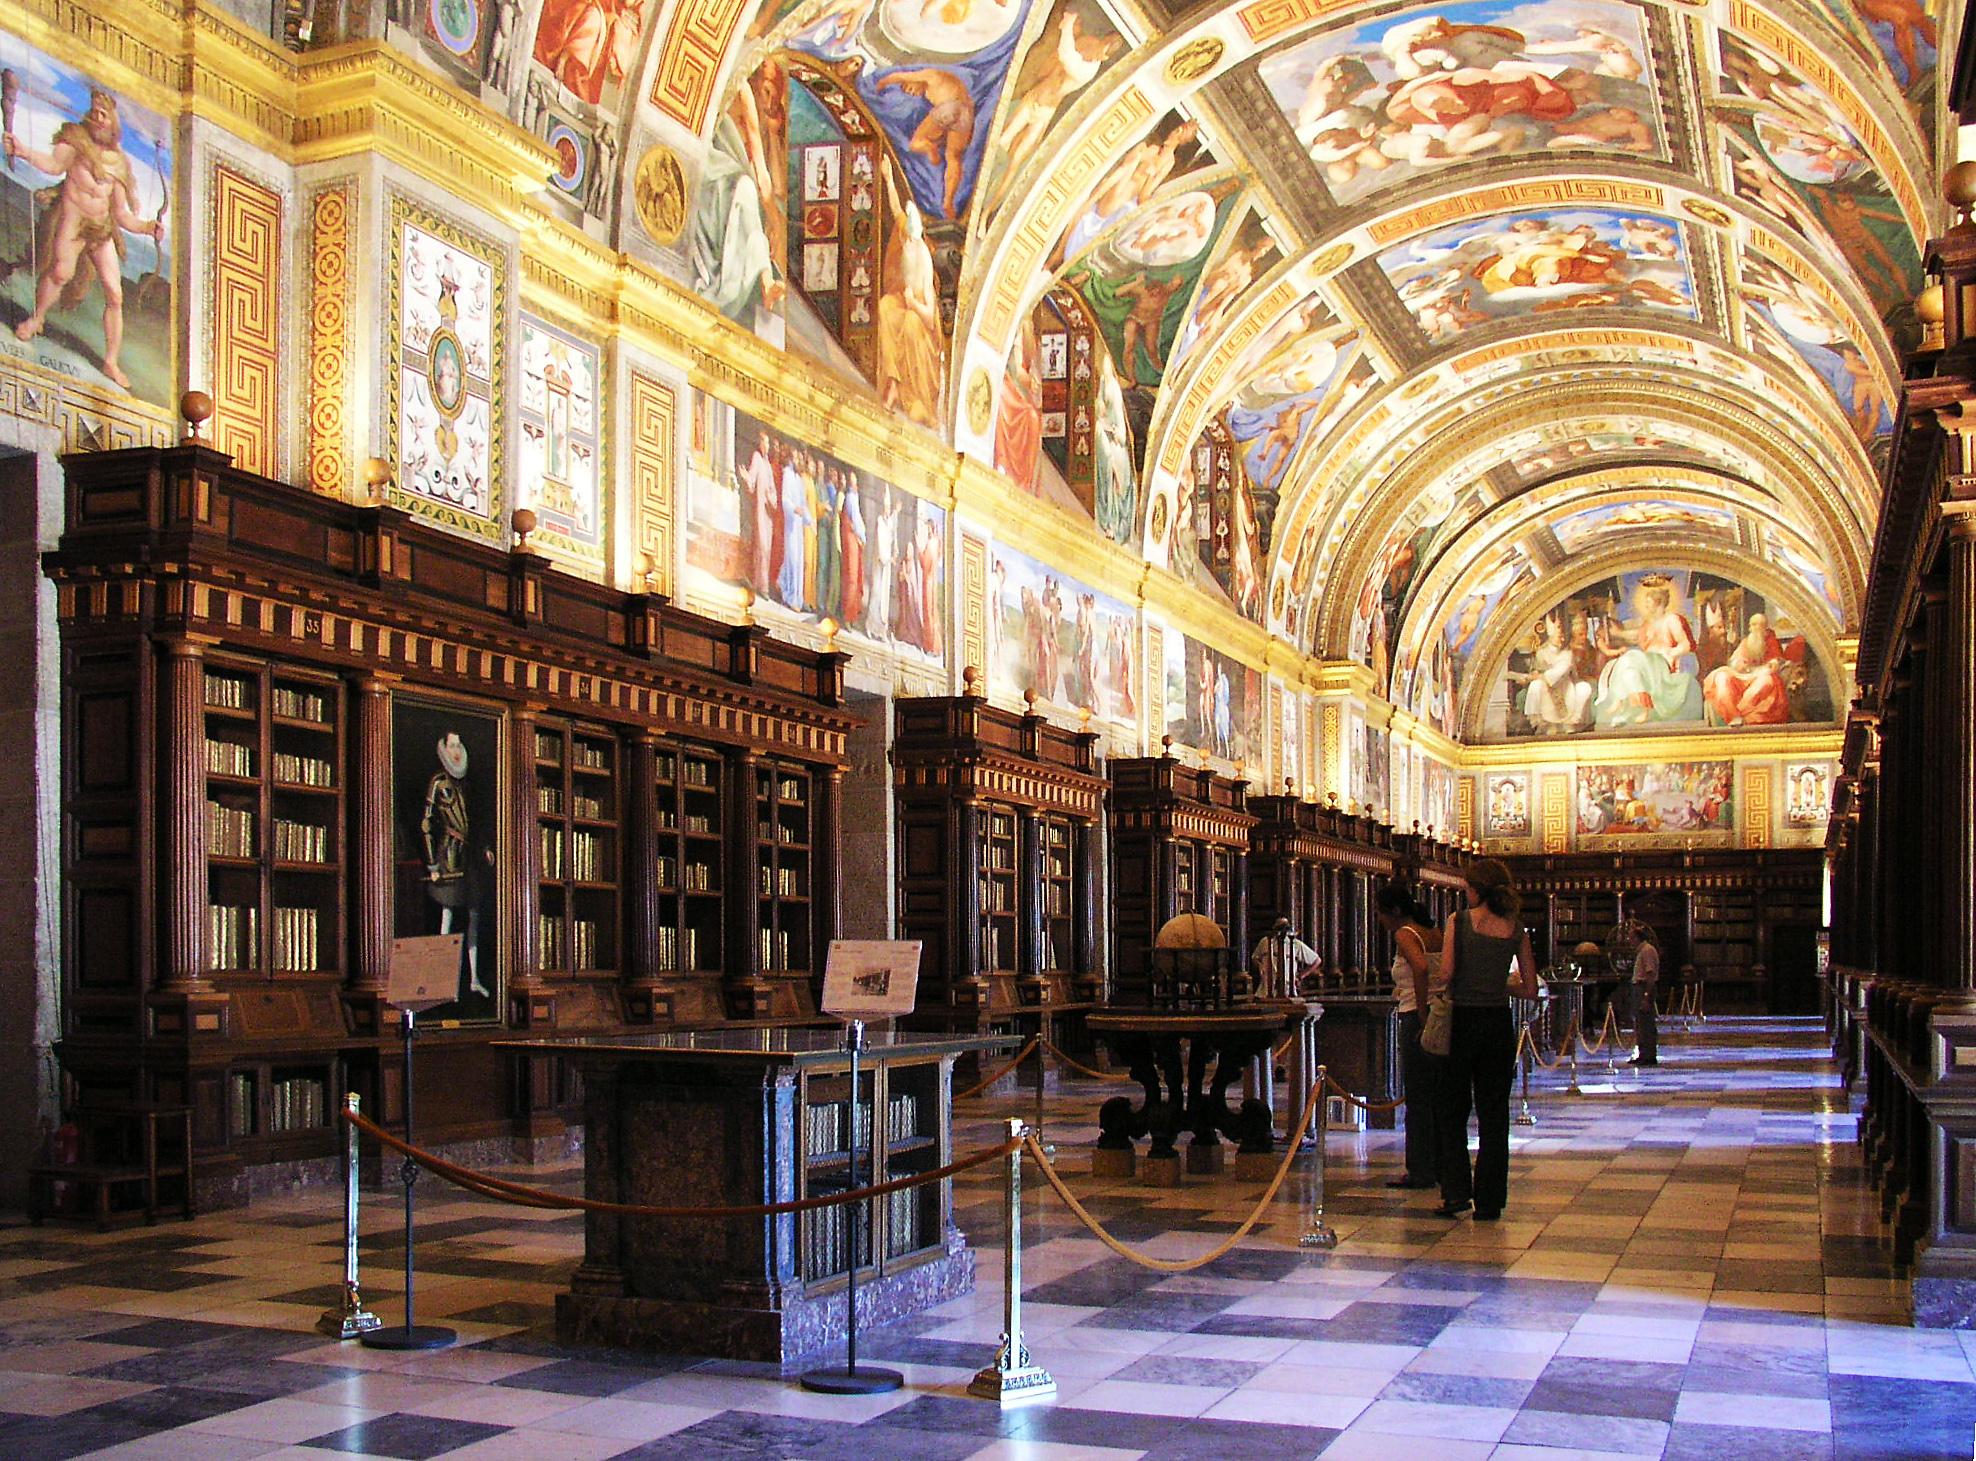 La bonita biblioteca de Felipe II, otro de sus regalos a España.